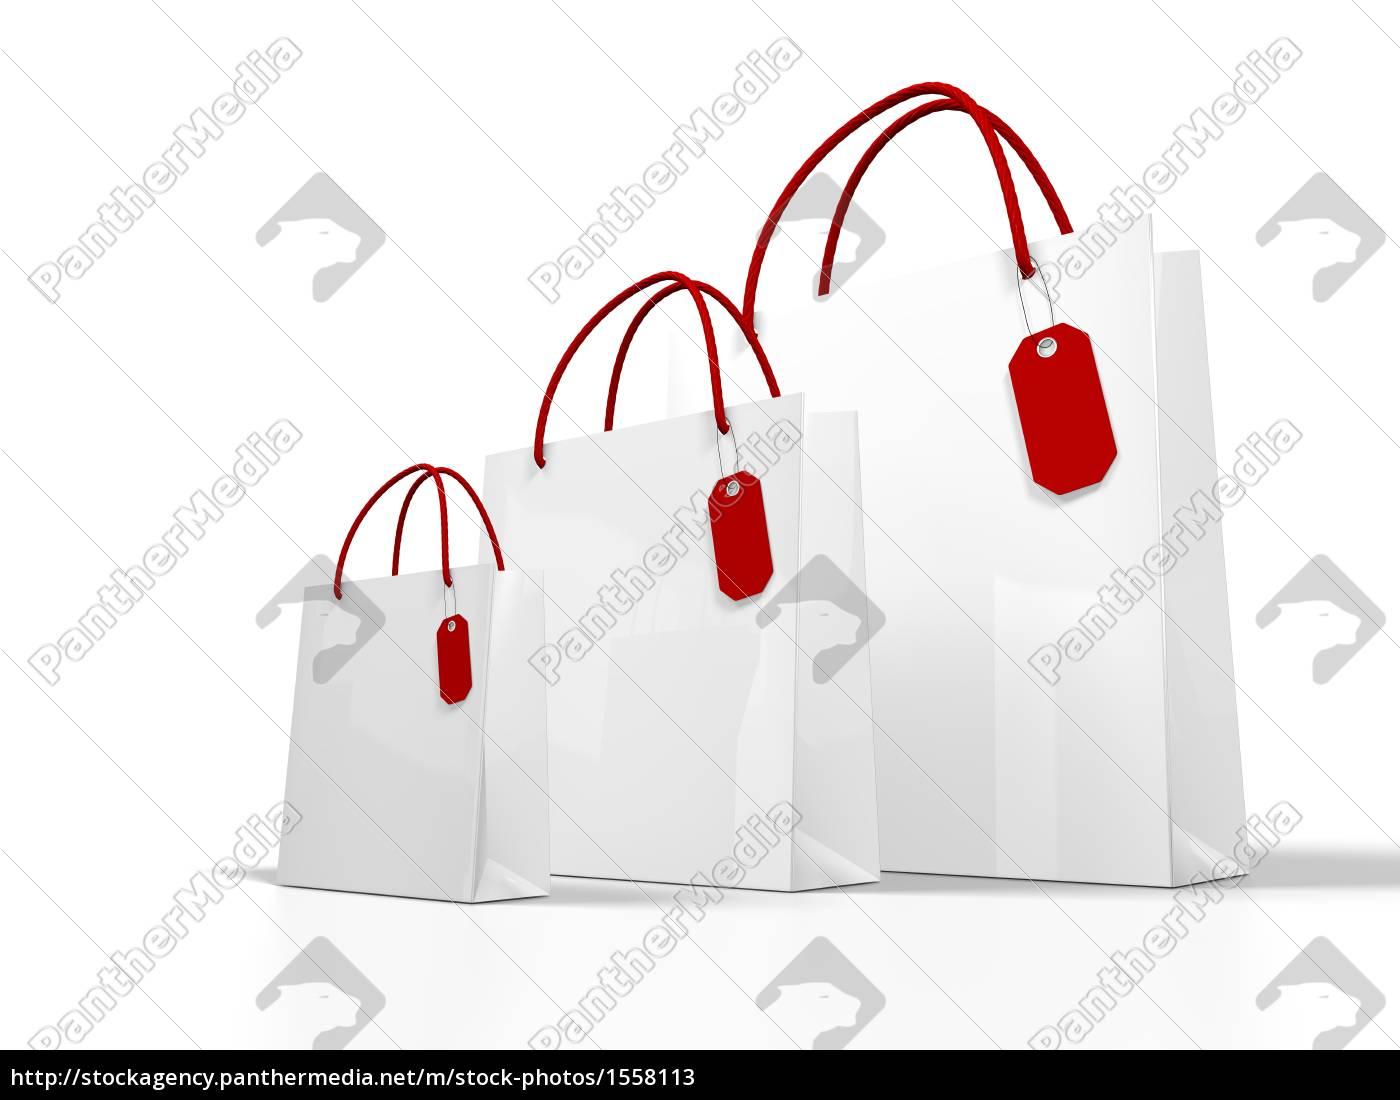 bag, paper, bag - 1558113